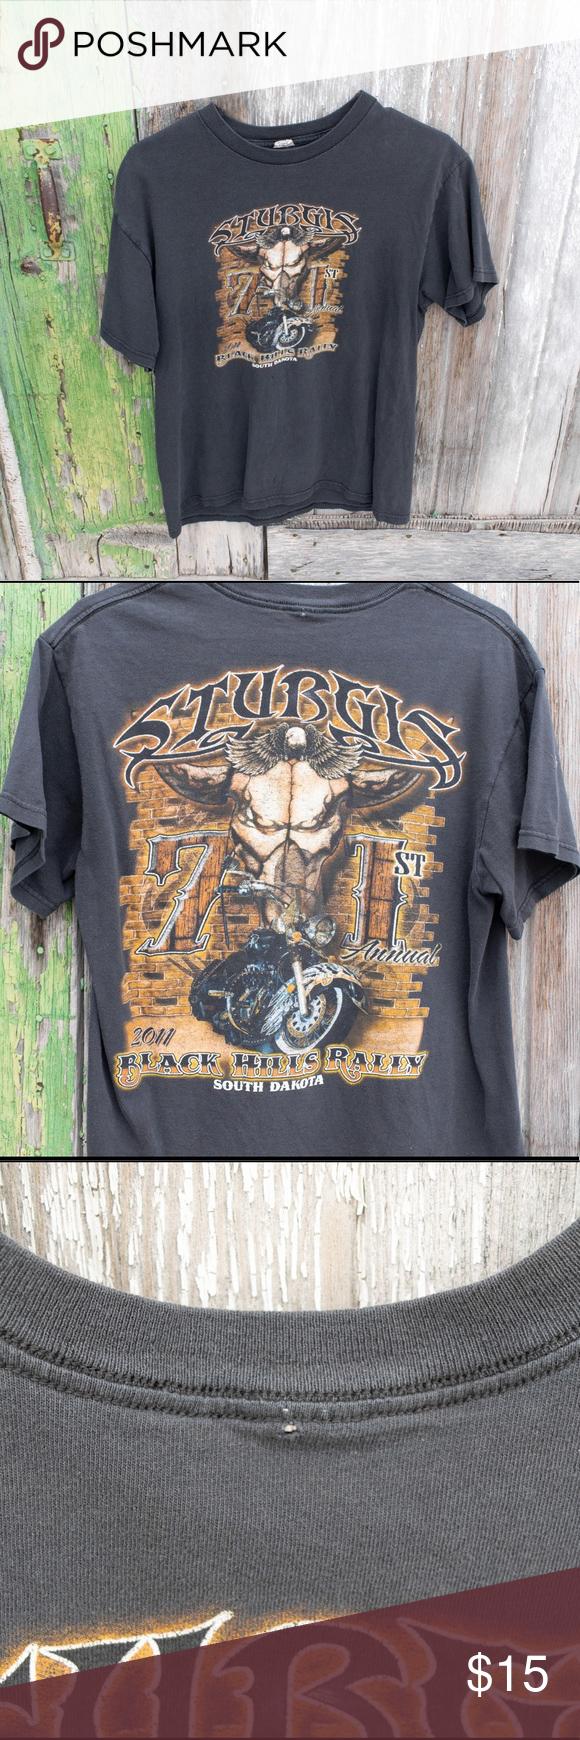 71st Annual Sturgis T Shirt T Shirt Shirts Clothes Design [ 1740 x 580 Pixel ]